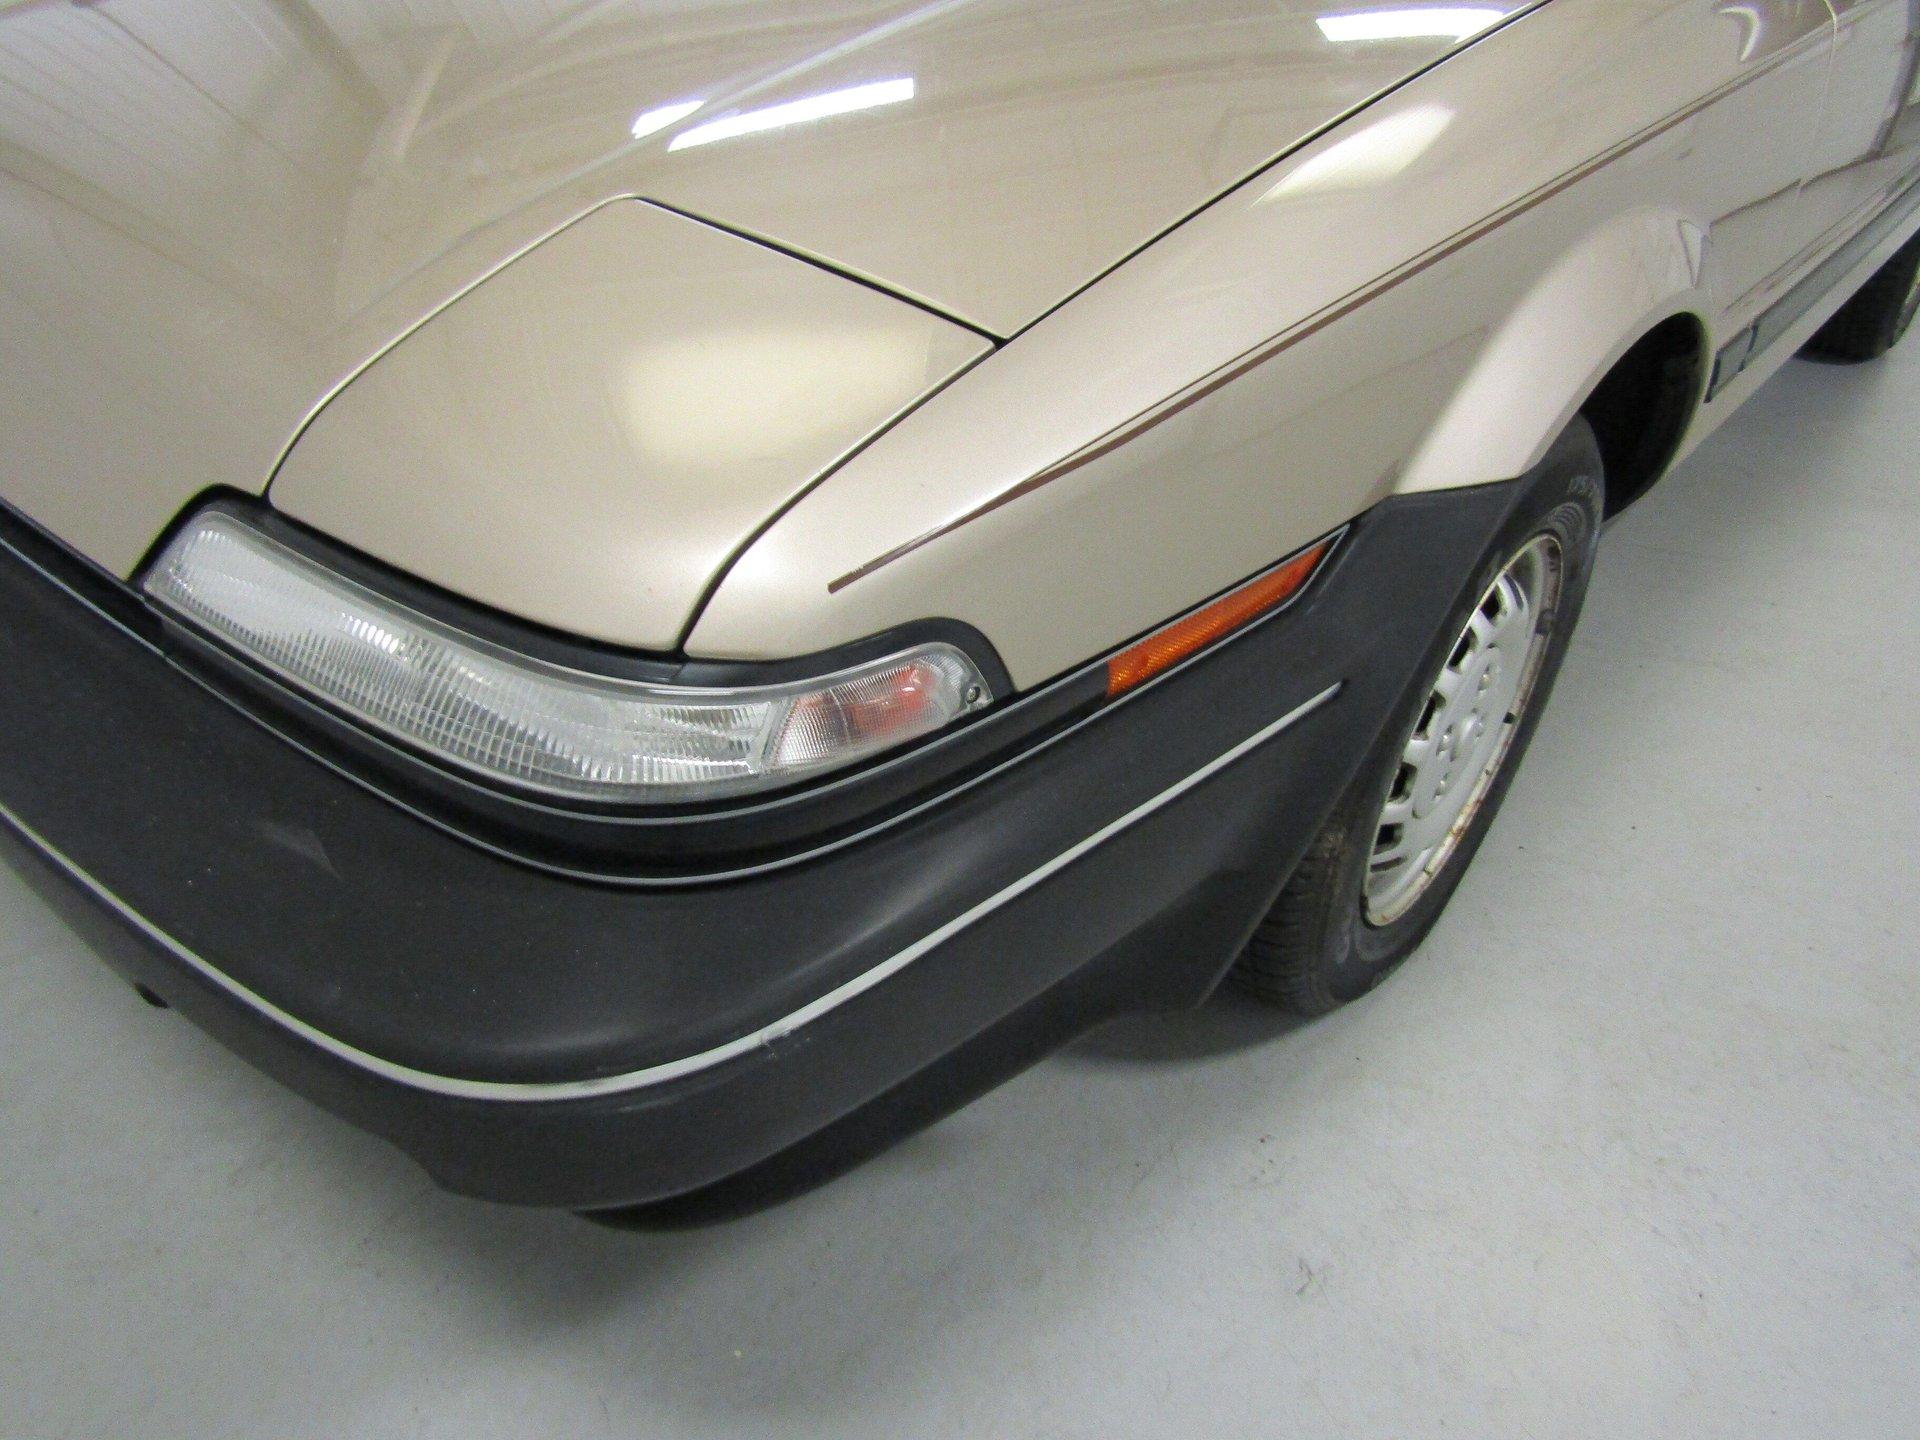 1989 Toyota Corolla